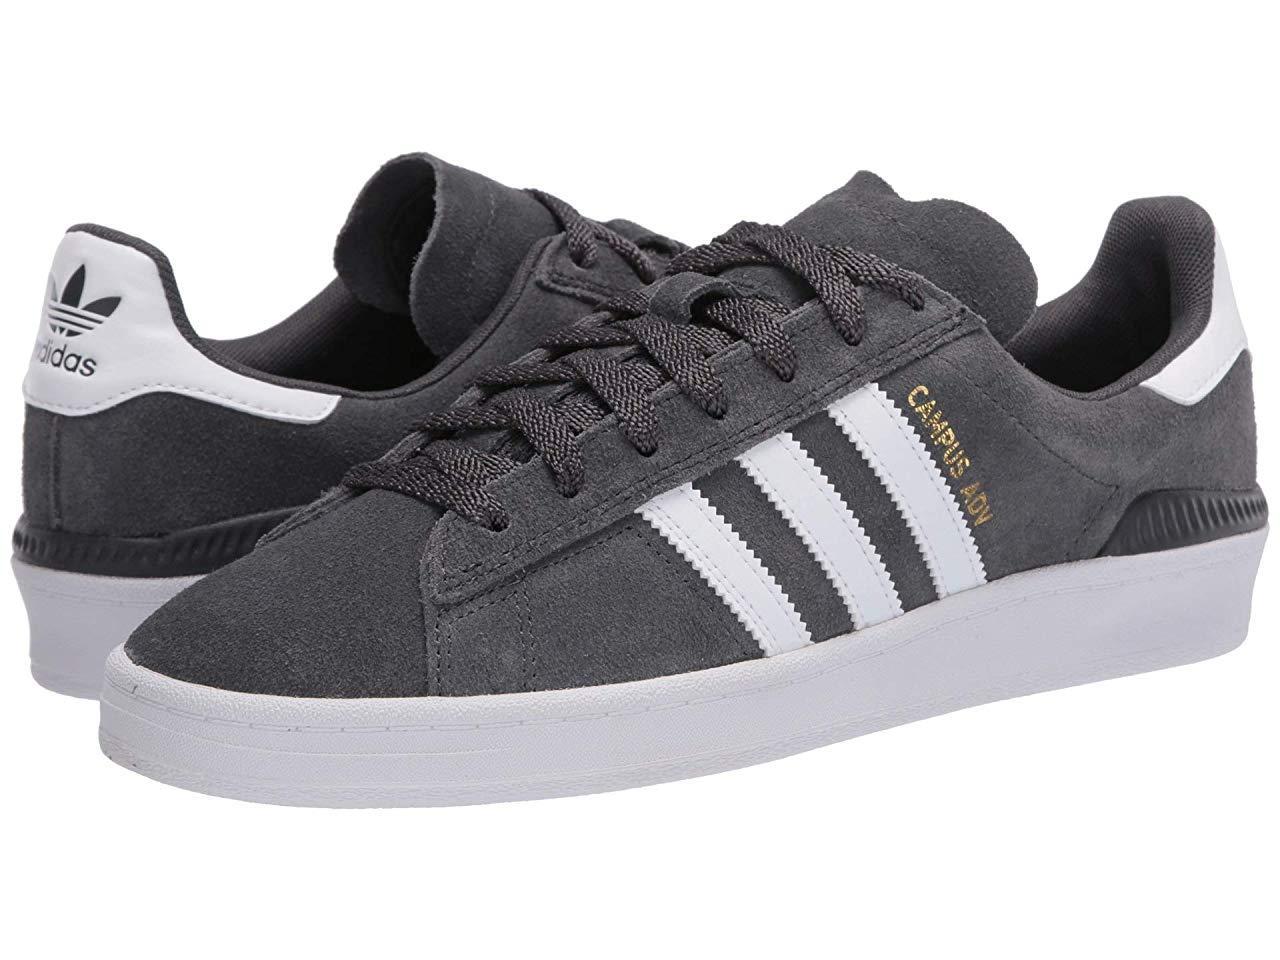 Кроссовки/Кеды (Оригинал) adidas Skateboarding Campus ADV Grey Six/Footwear White/Gold Metallic